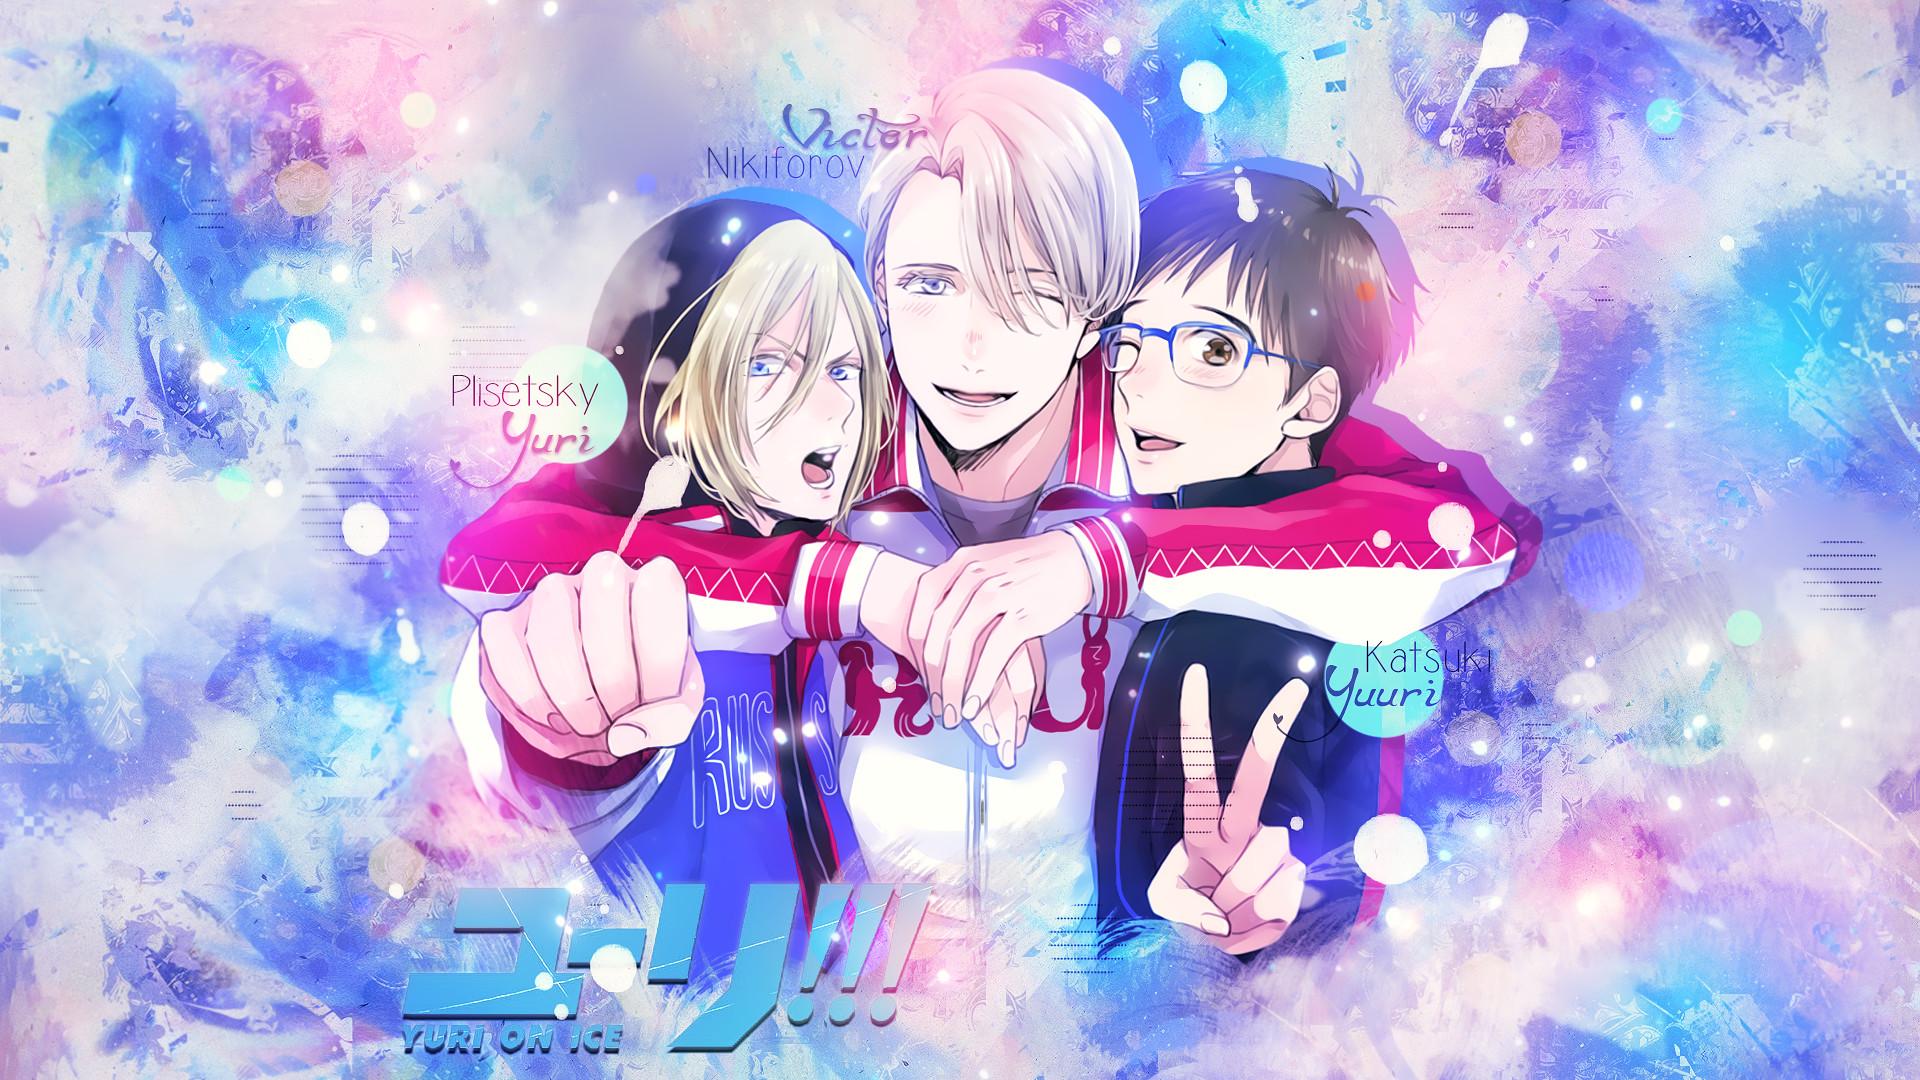 Anime – Yuri!!! on Ice Yuri Plisetsky Yuuri Katsuki Viktor Nikiforov  Bakgrund